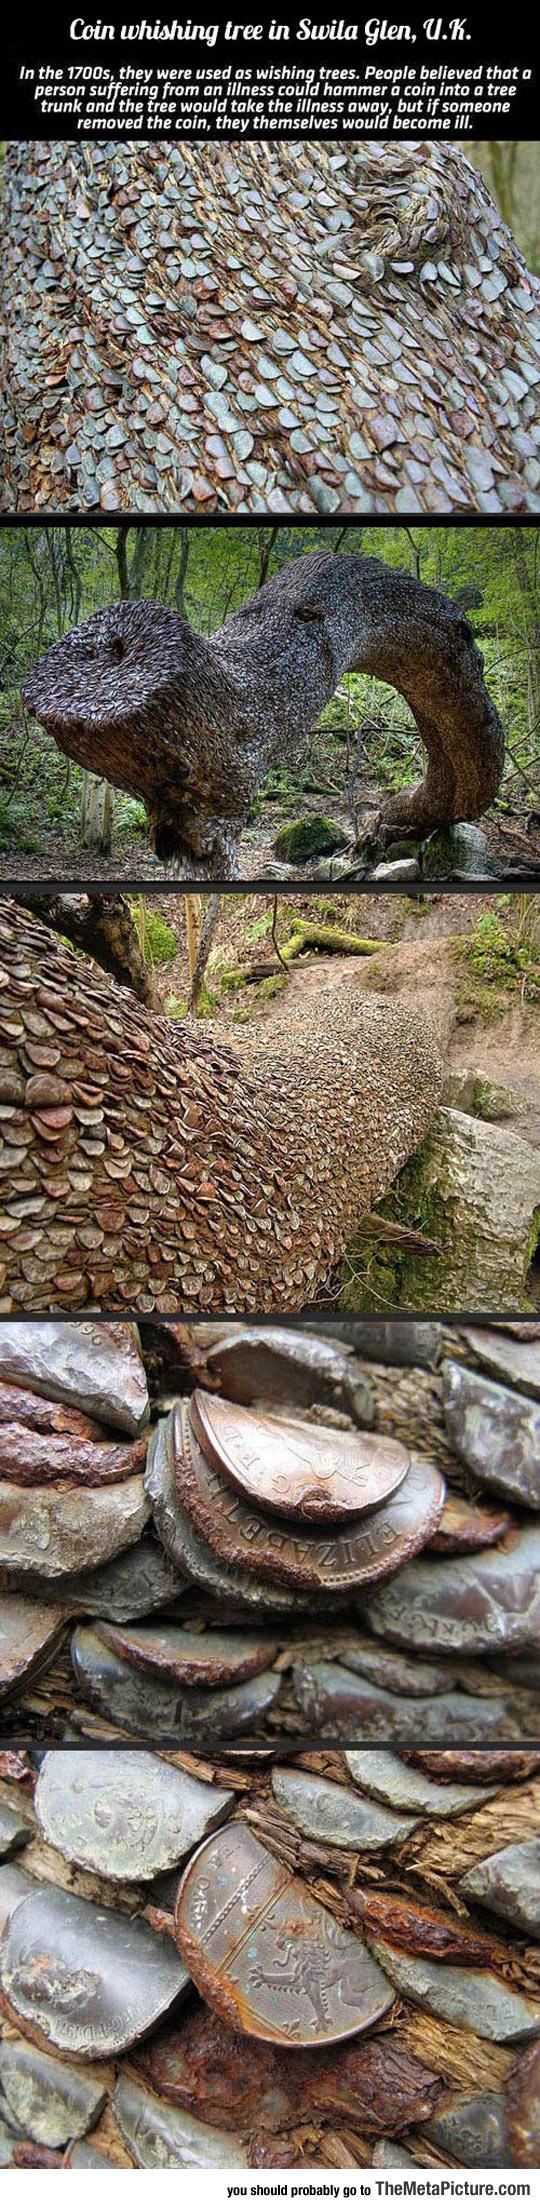 cool-coin-whishing-tree-UK-woods